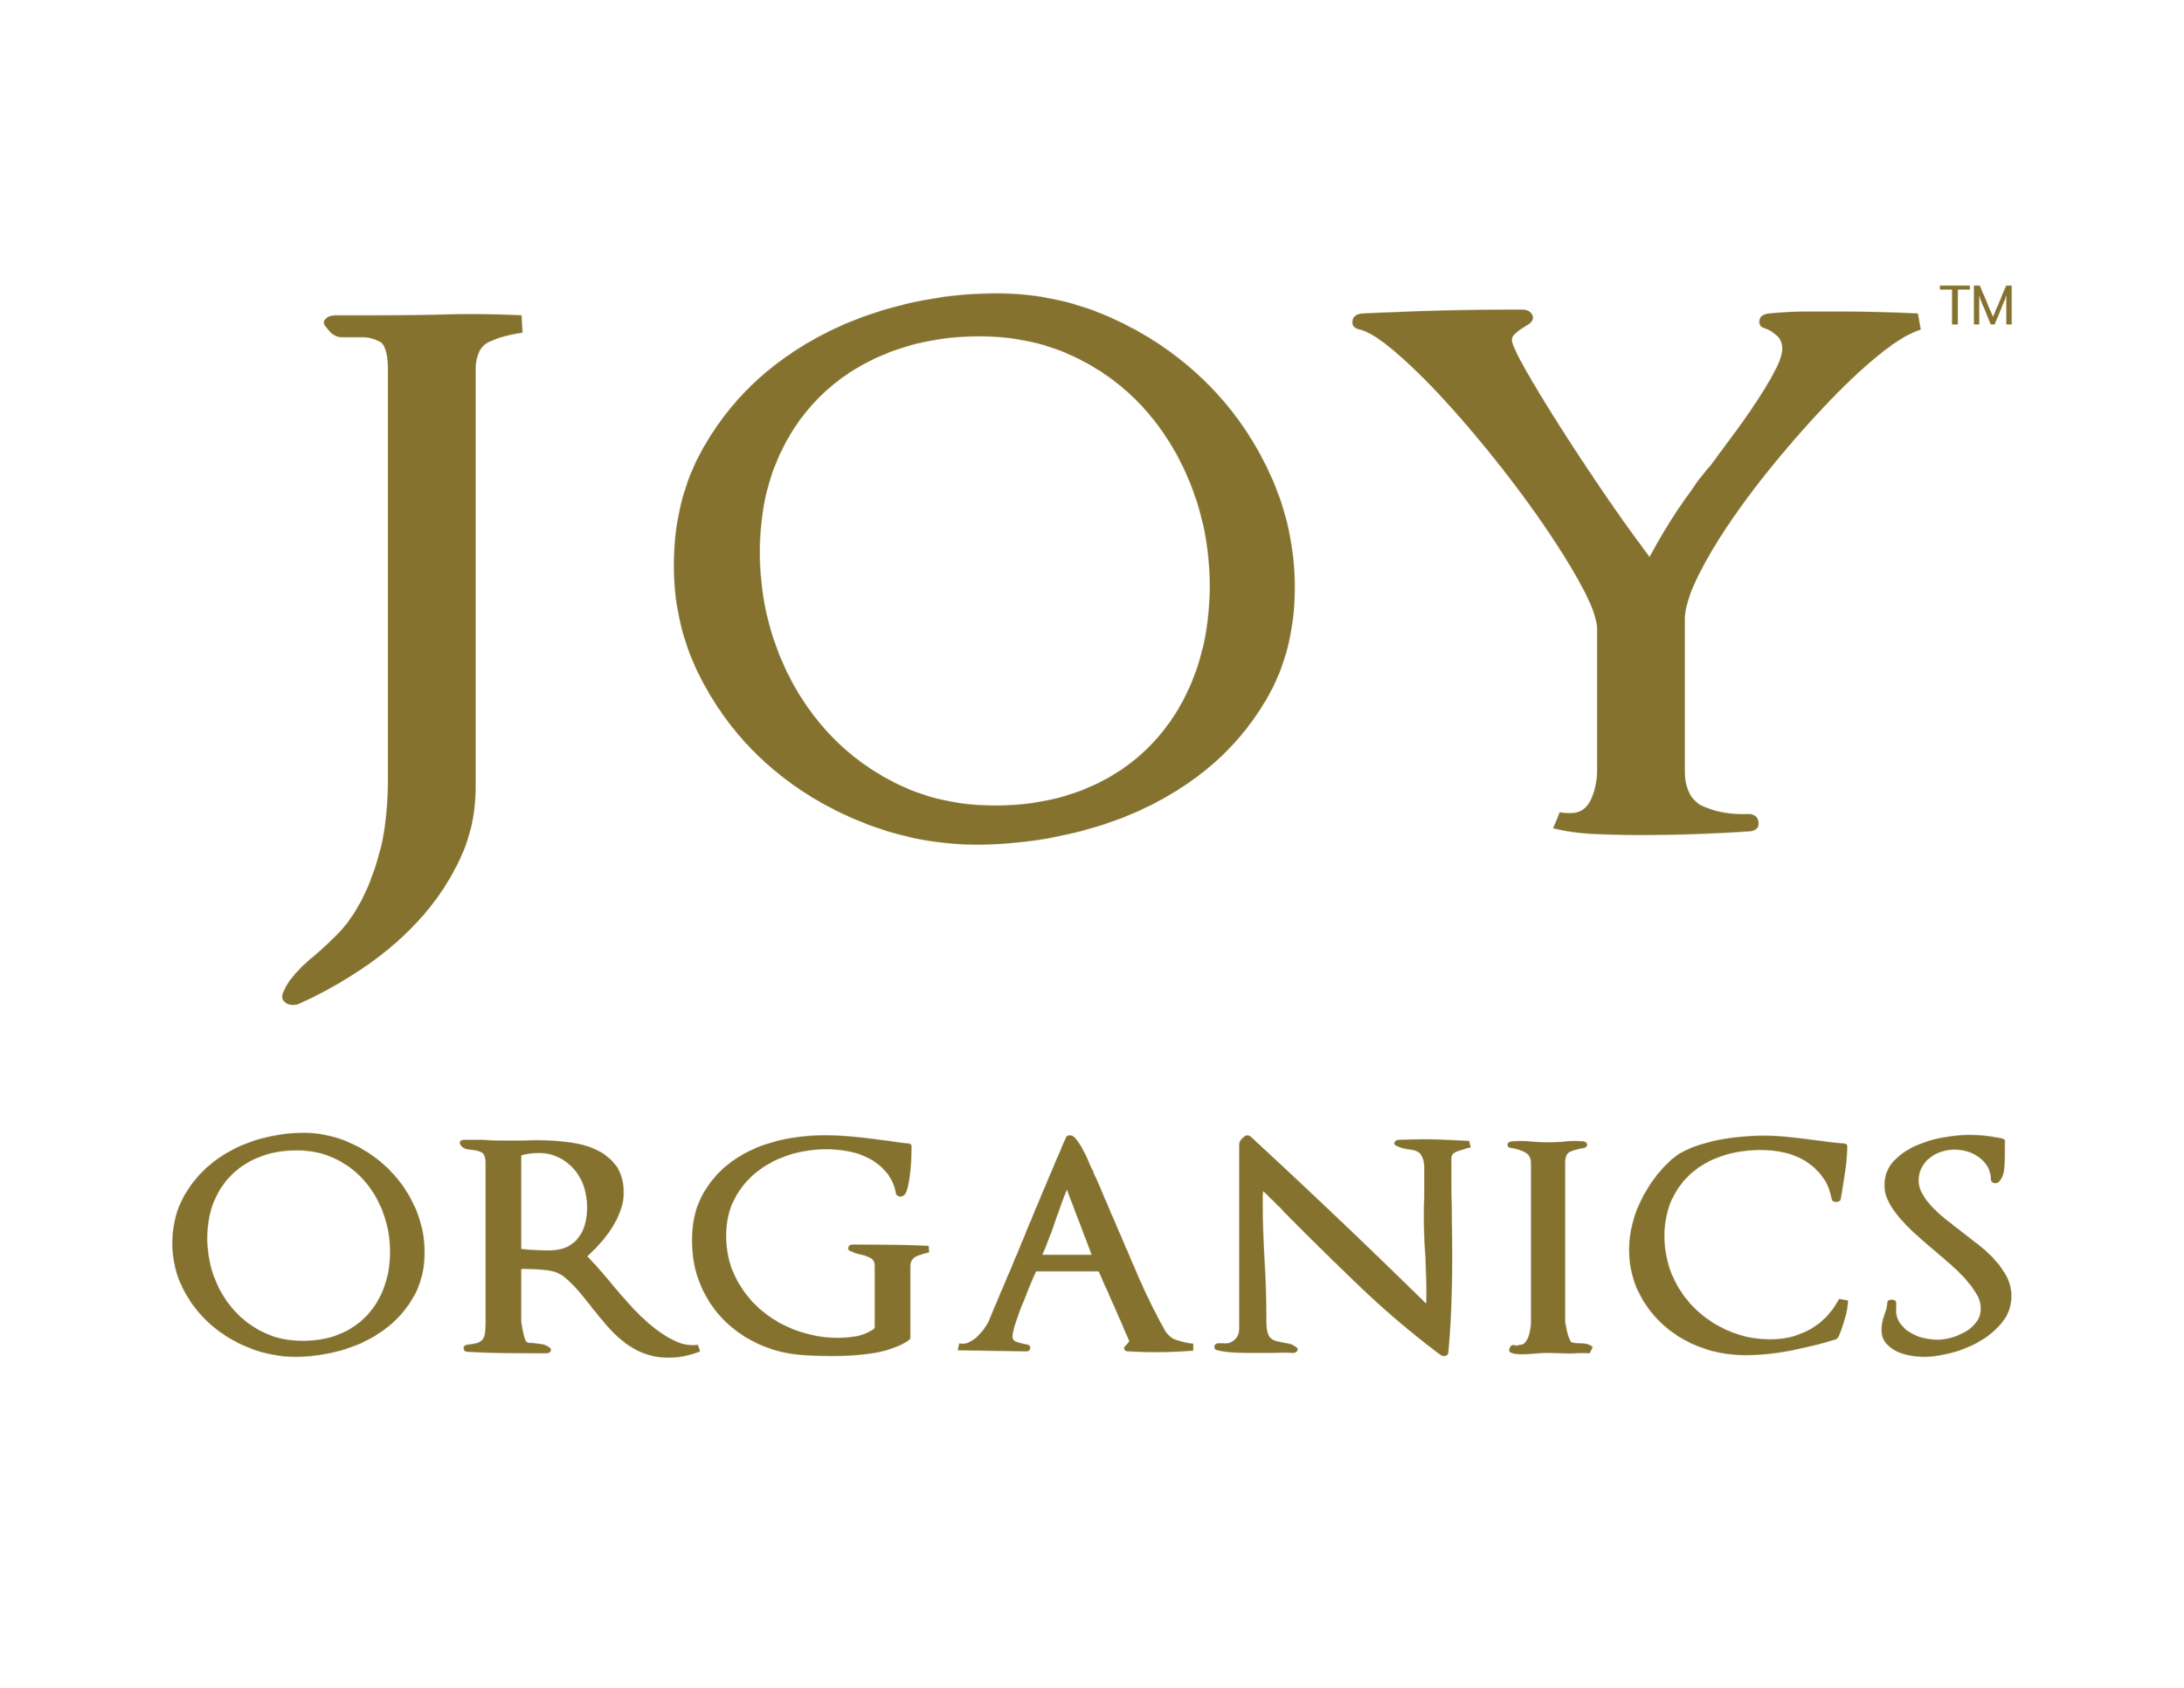 Joy_Organics.png